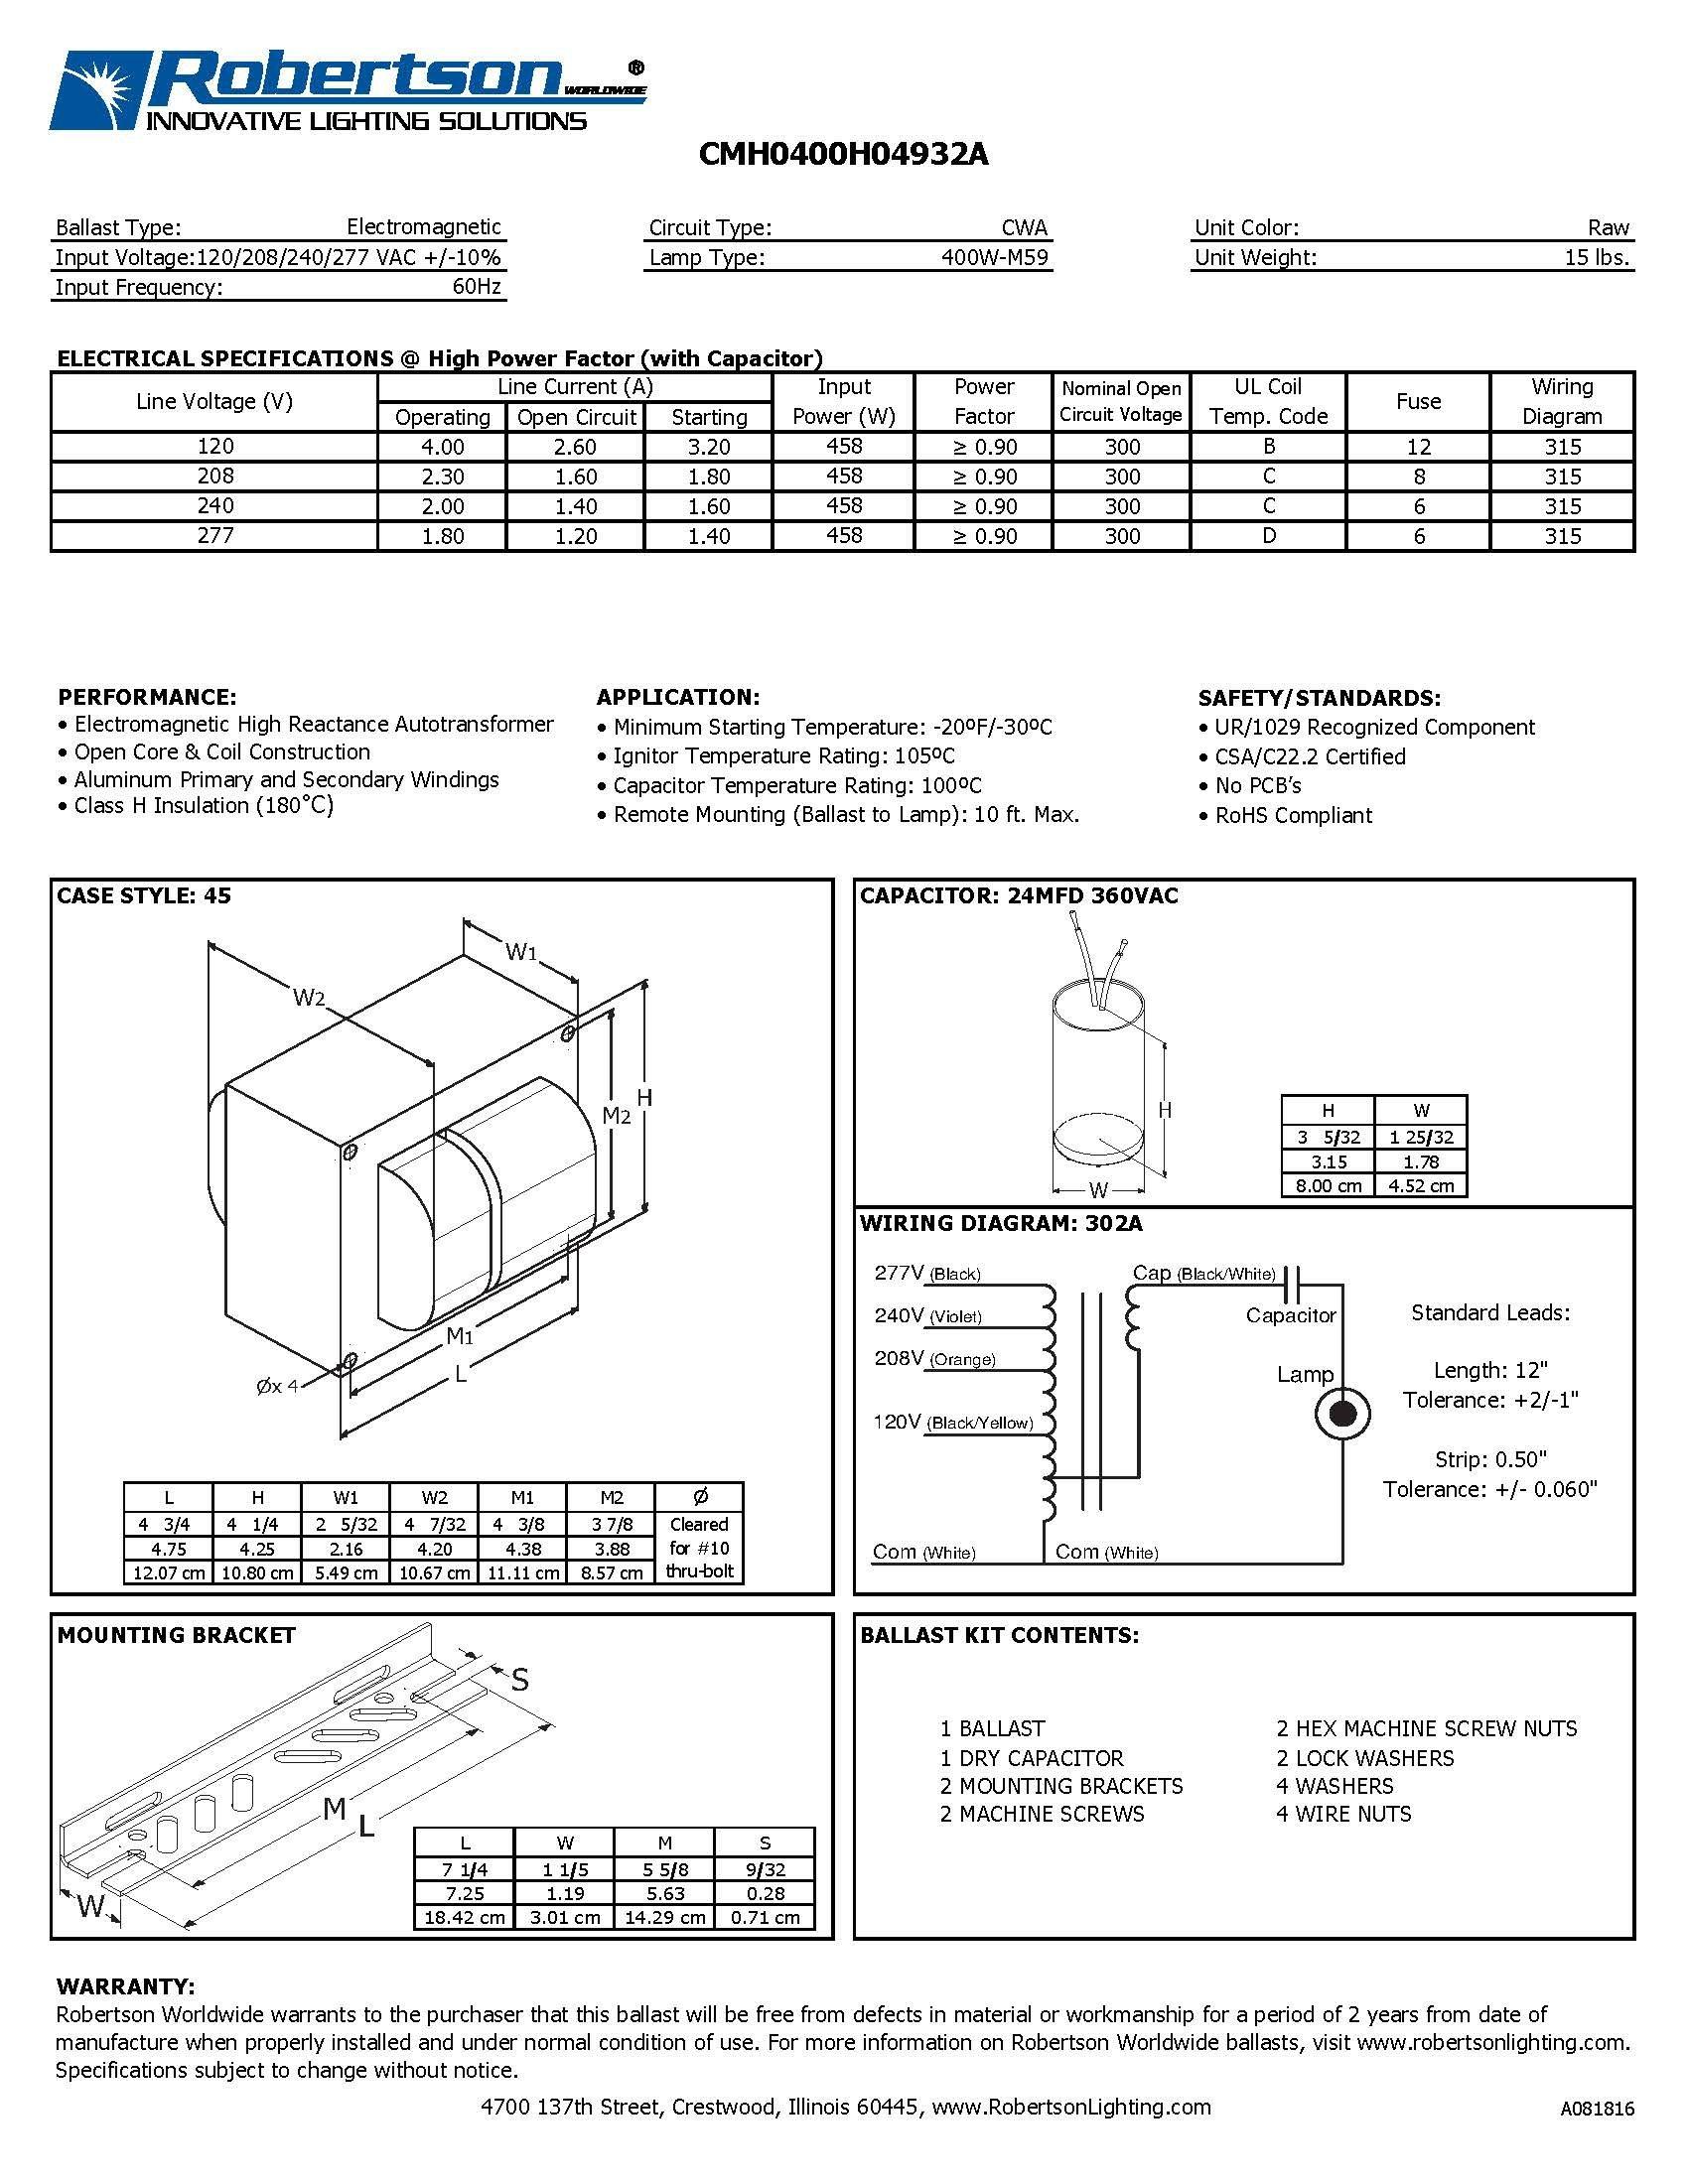 ROBERTSON 3P10040 HID CWA mHID ballast for 1 400 Watt, M59 Metal Halide Lamp, 120/208/240/277Vac, 60Hz, Normal Ballast Factor, HPF, Model CMH0400H04932A (Replaces Model CMH0400H04932)